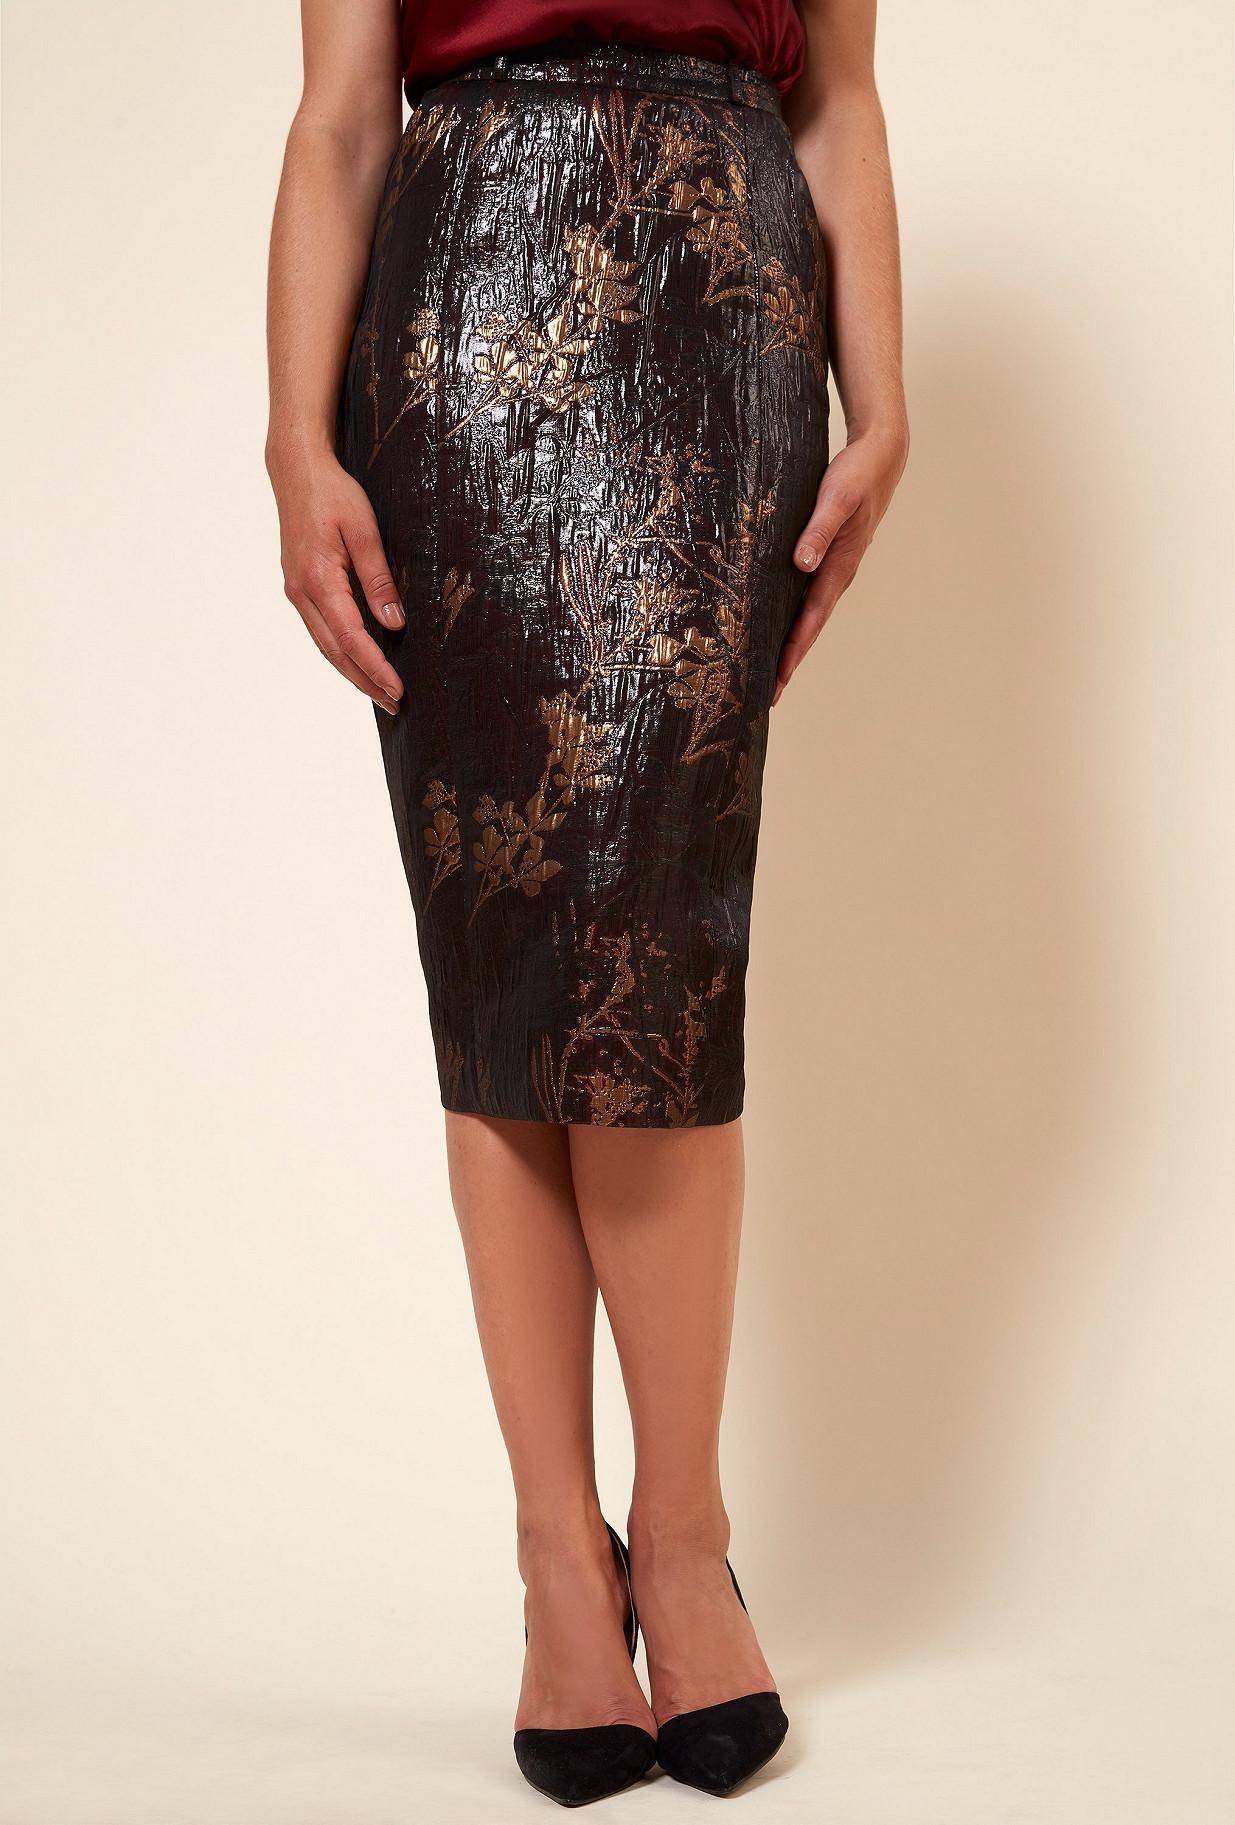 Paris clothes store Skirt  Quantic french designer fashion Paris